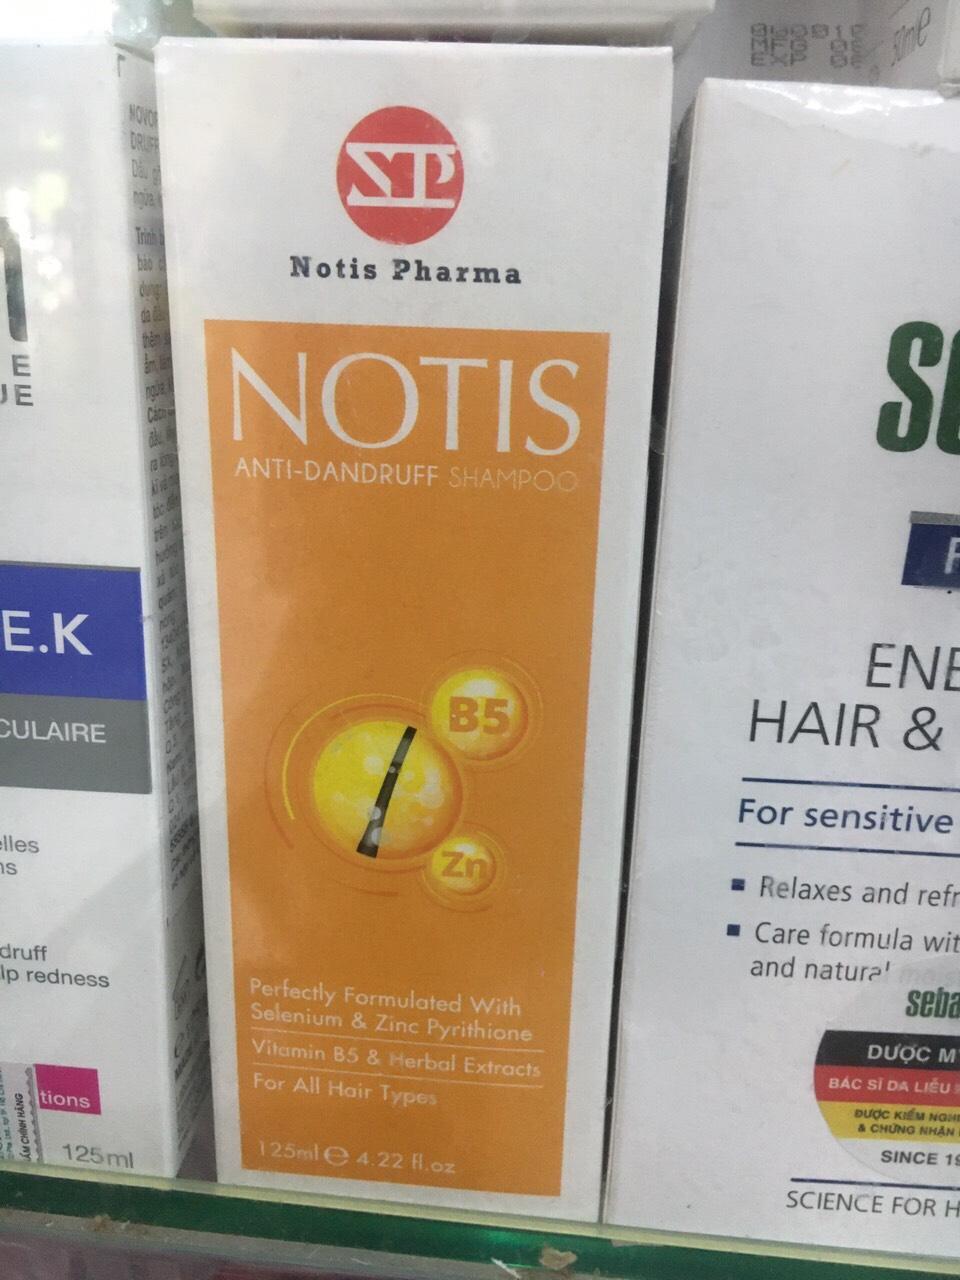 DẦU GỘI NOTIS Anti Dandruff Shampoo